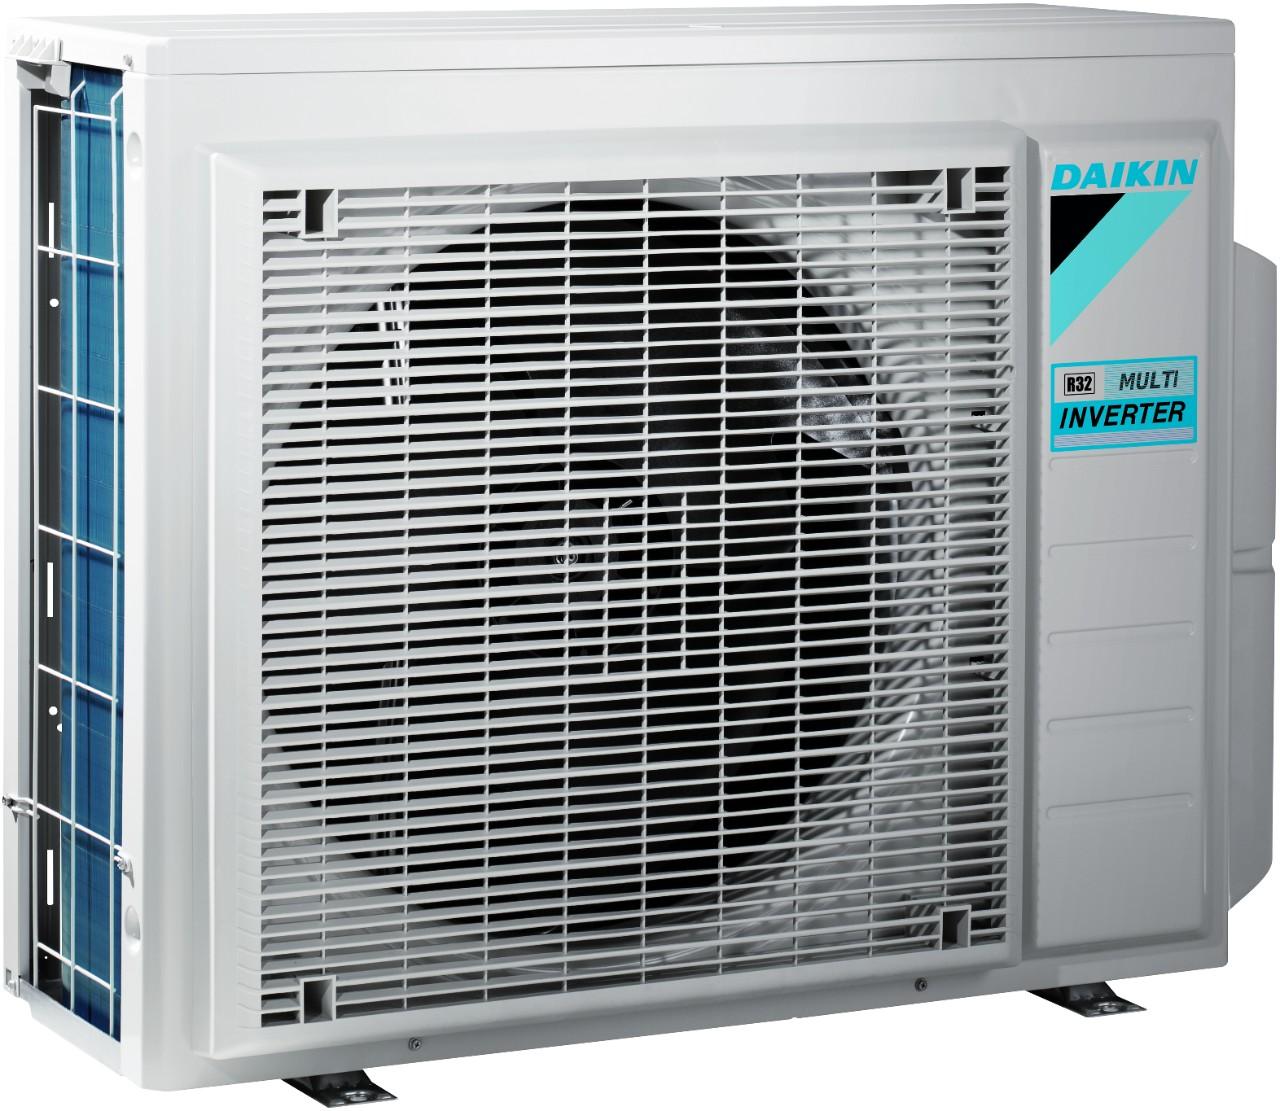 Climatiseur DAIKIN multi réversible inverser 5MXM90N.